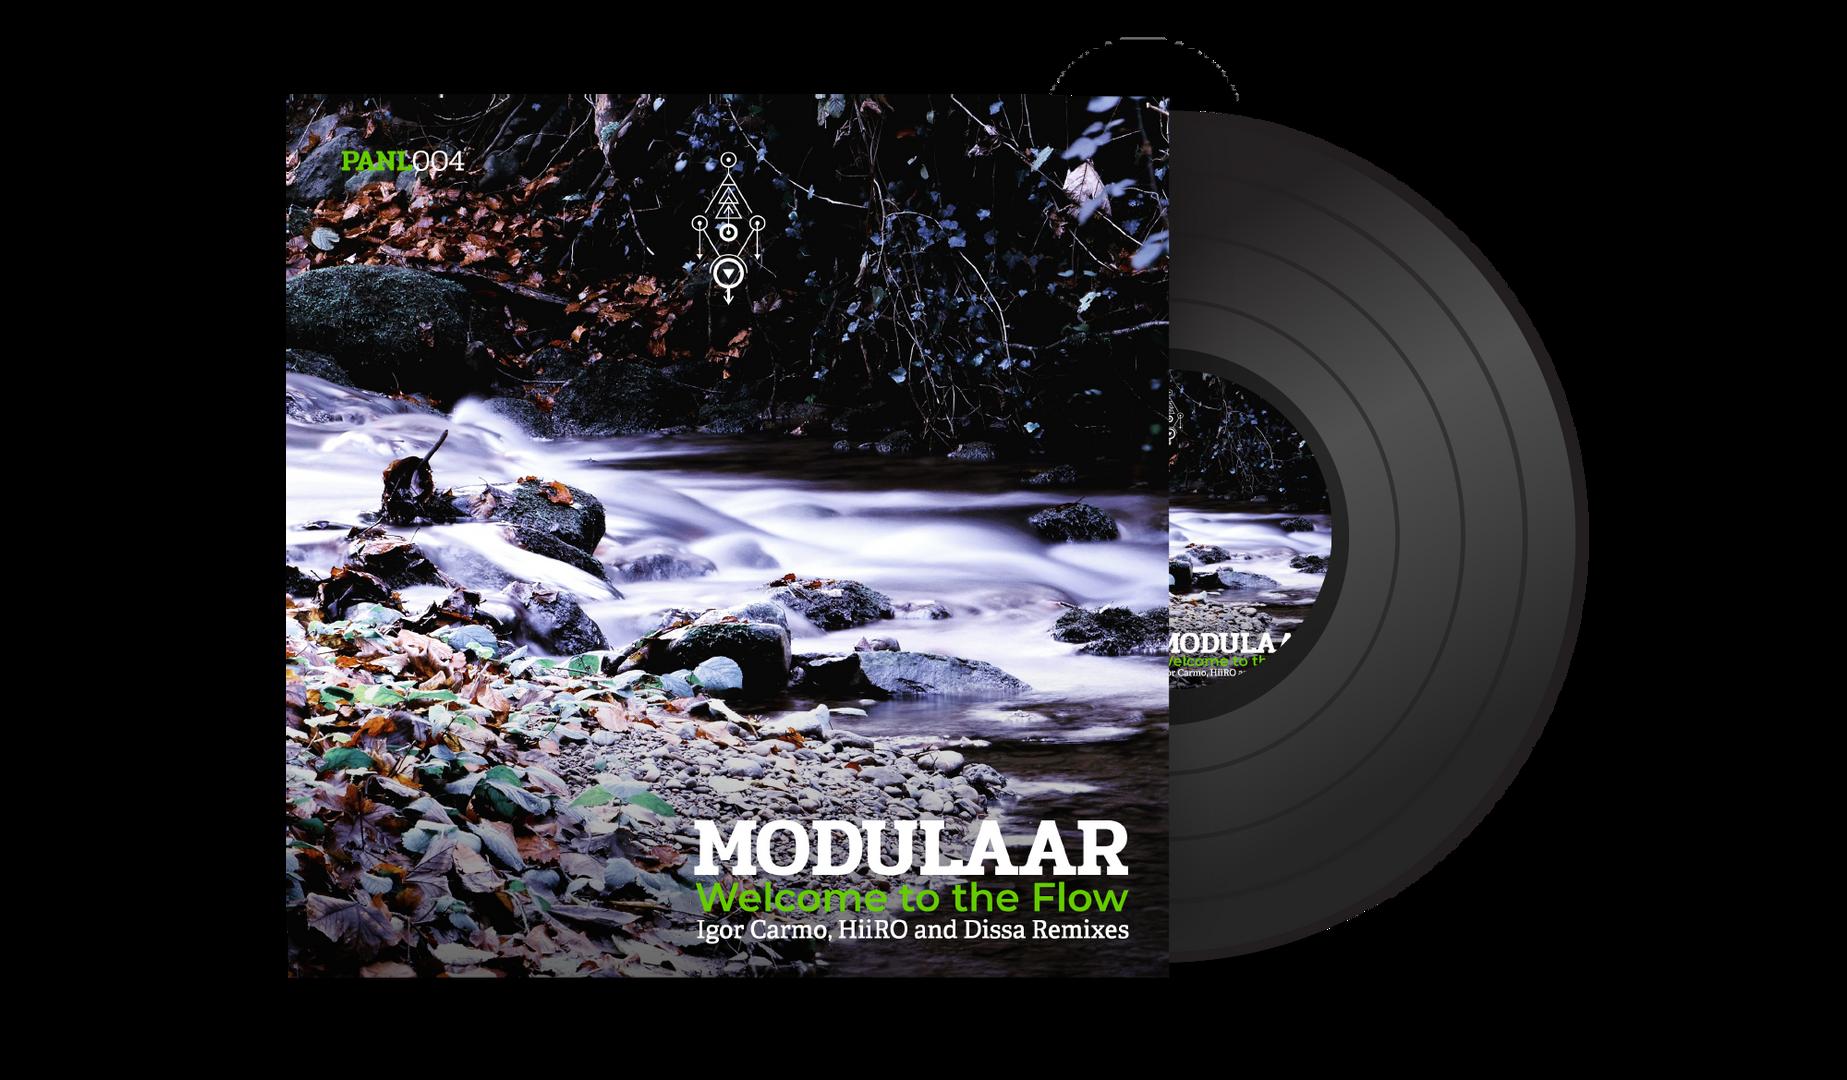 Modulaar - Welcome to the Flow (HiiRO Remix)